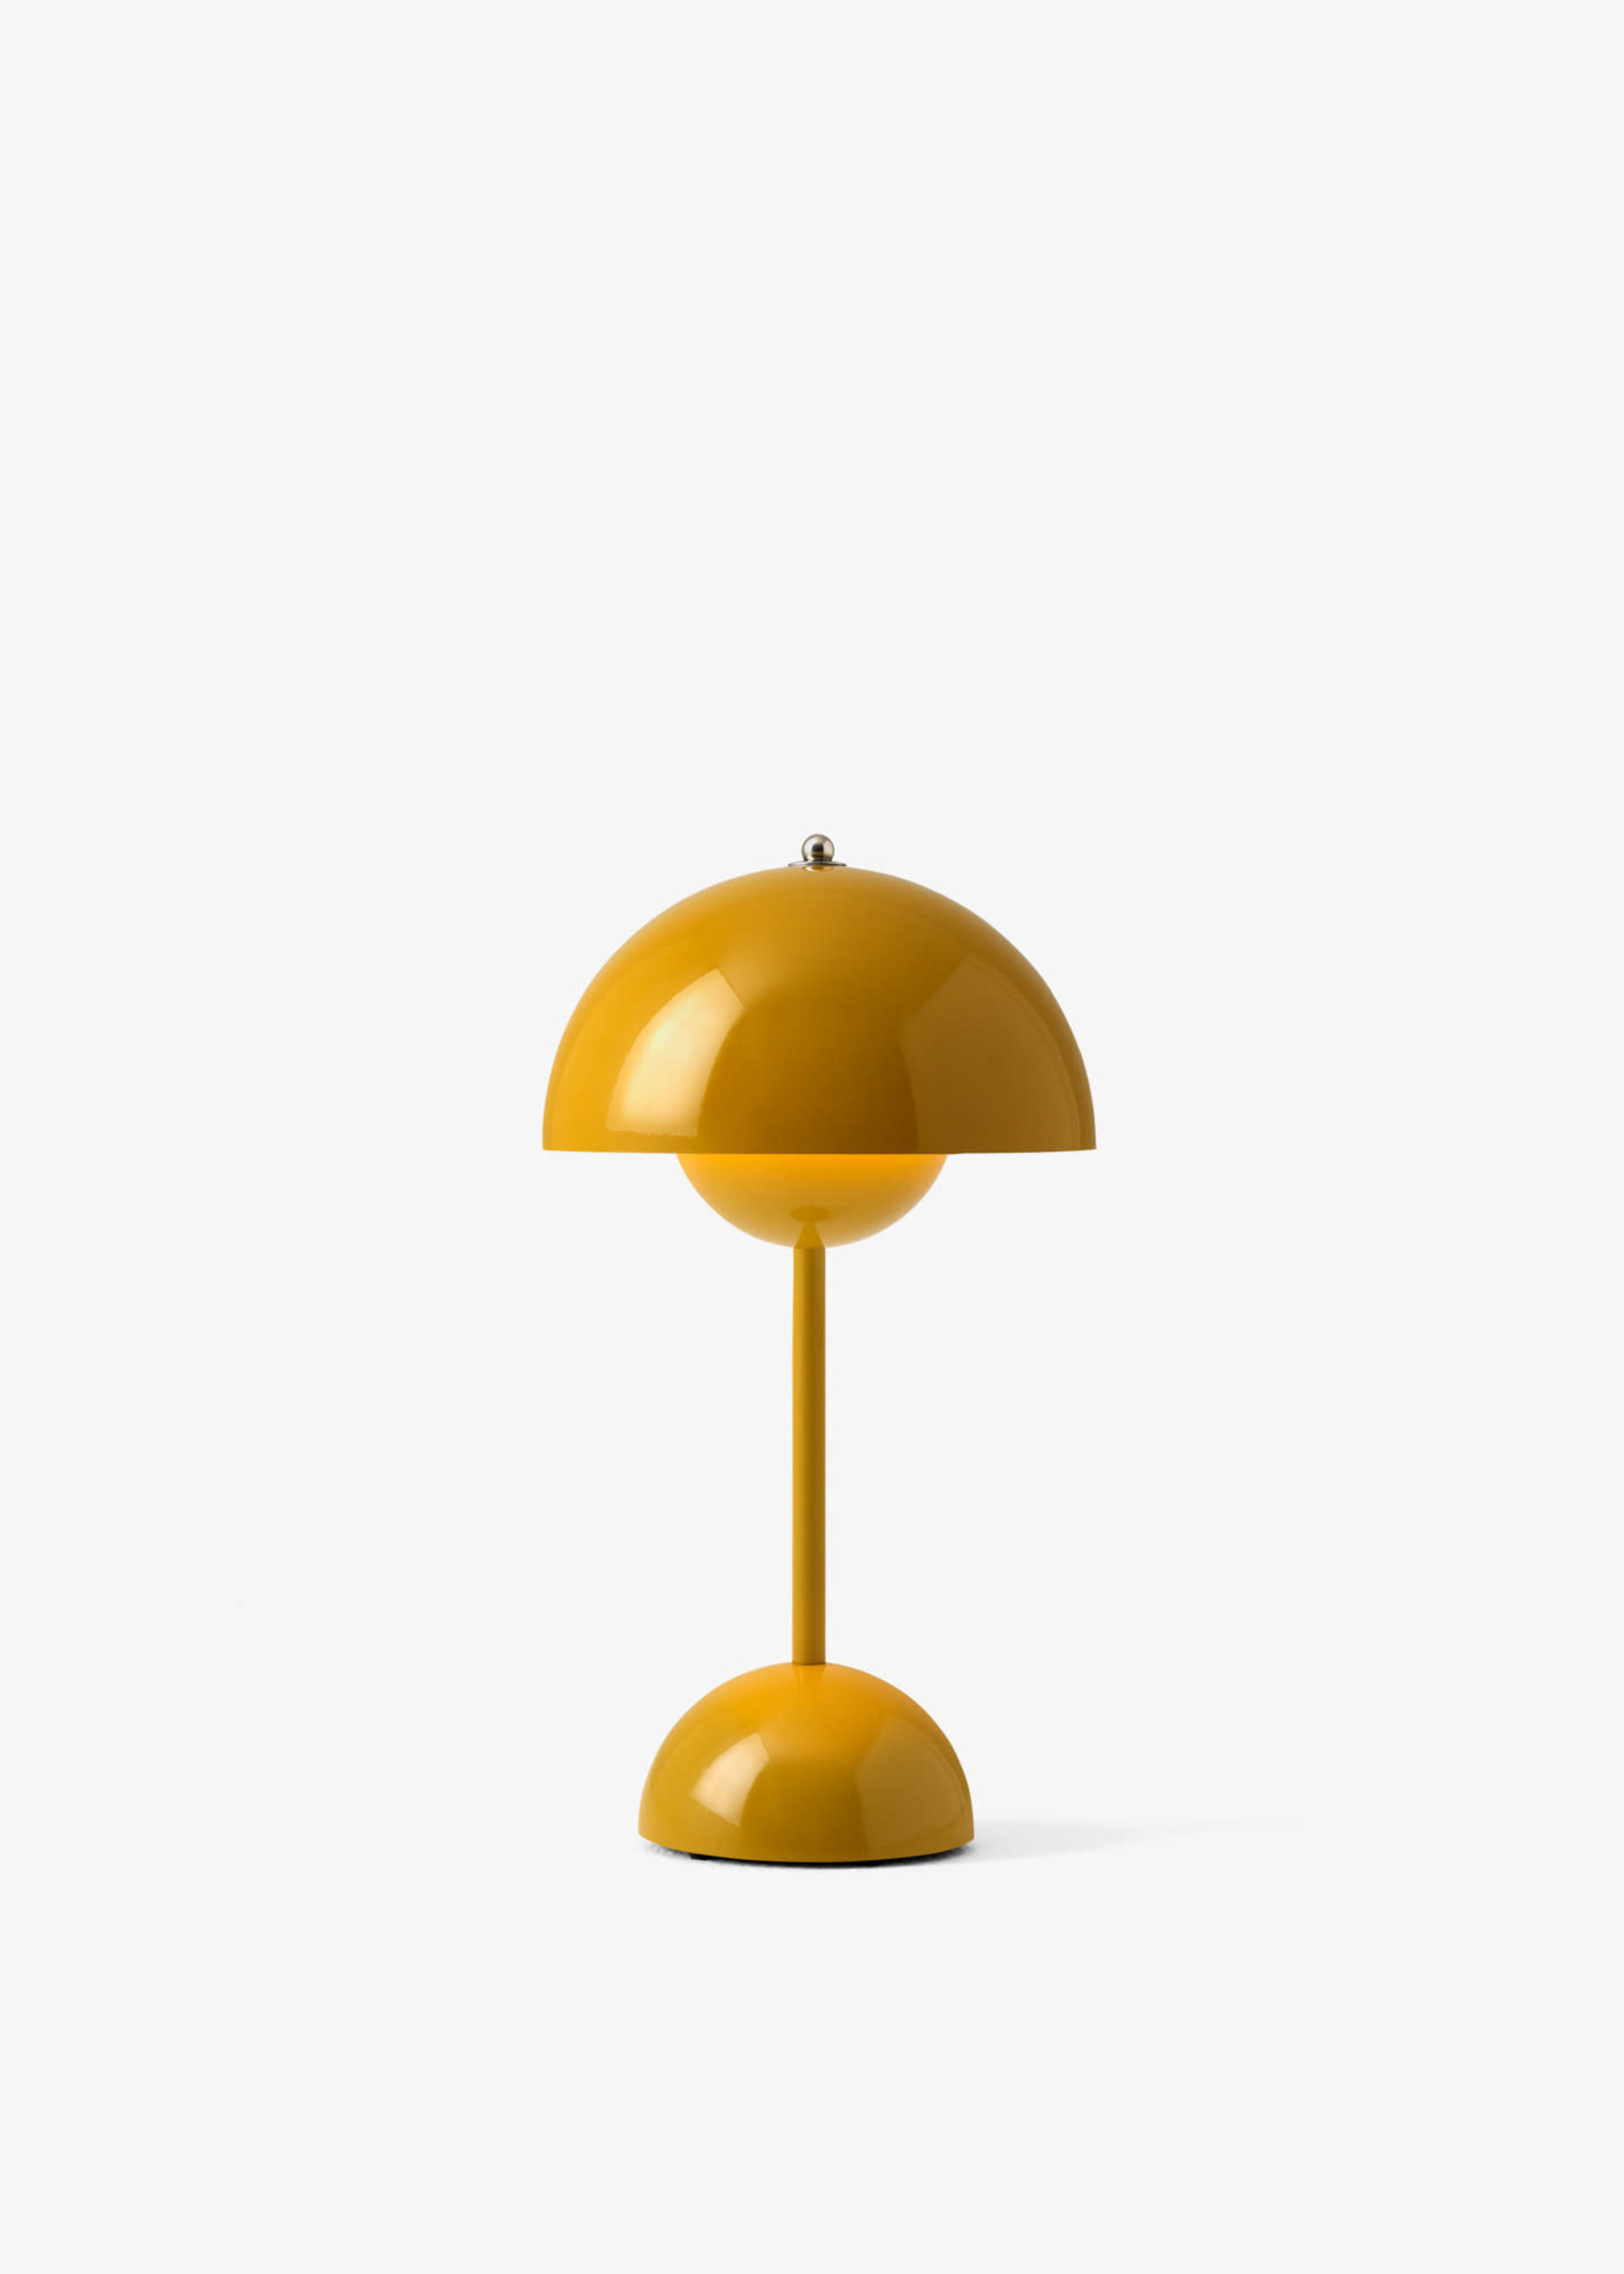 & Tradition Verner Panton Flower Pot Mini Lamp in Mustard